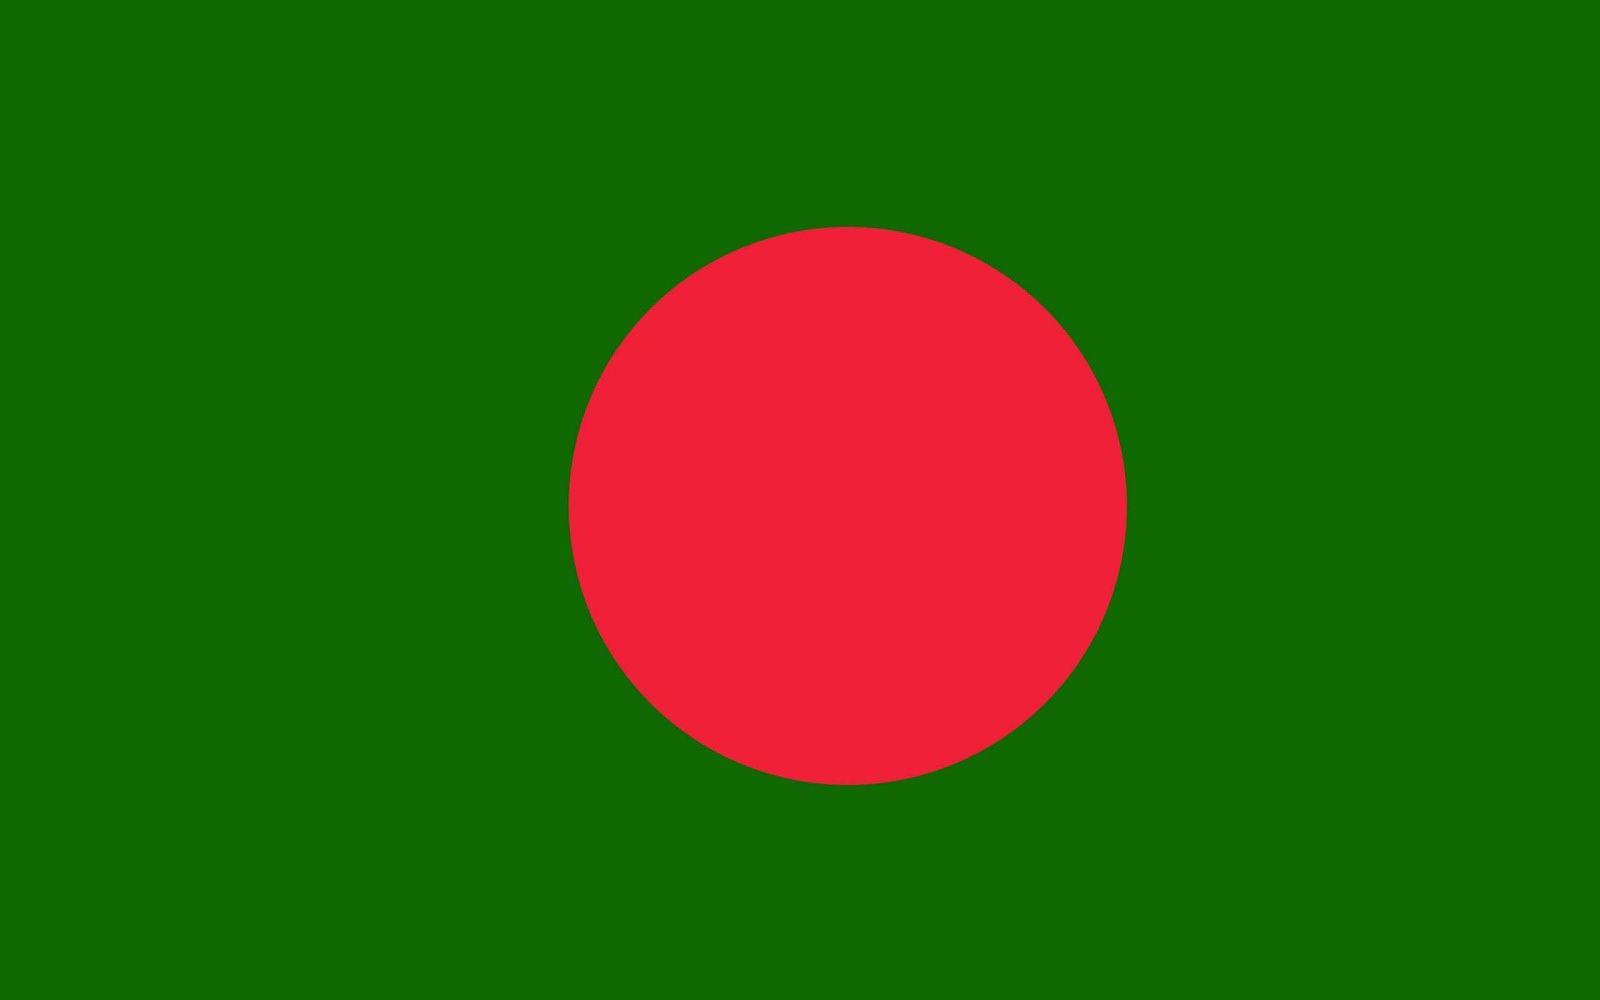 Bangladesh flag | World Thinking Day | Pinterest | Bangladesh flag ...